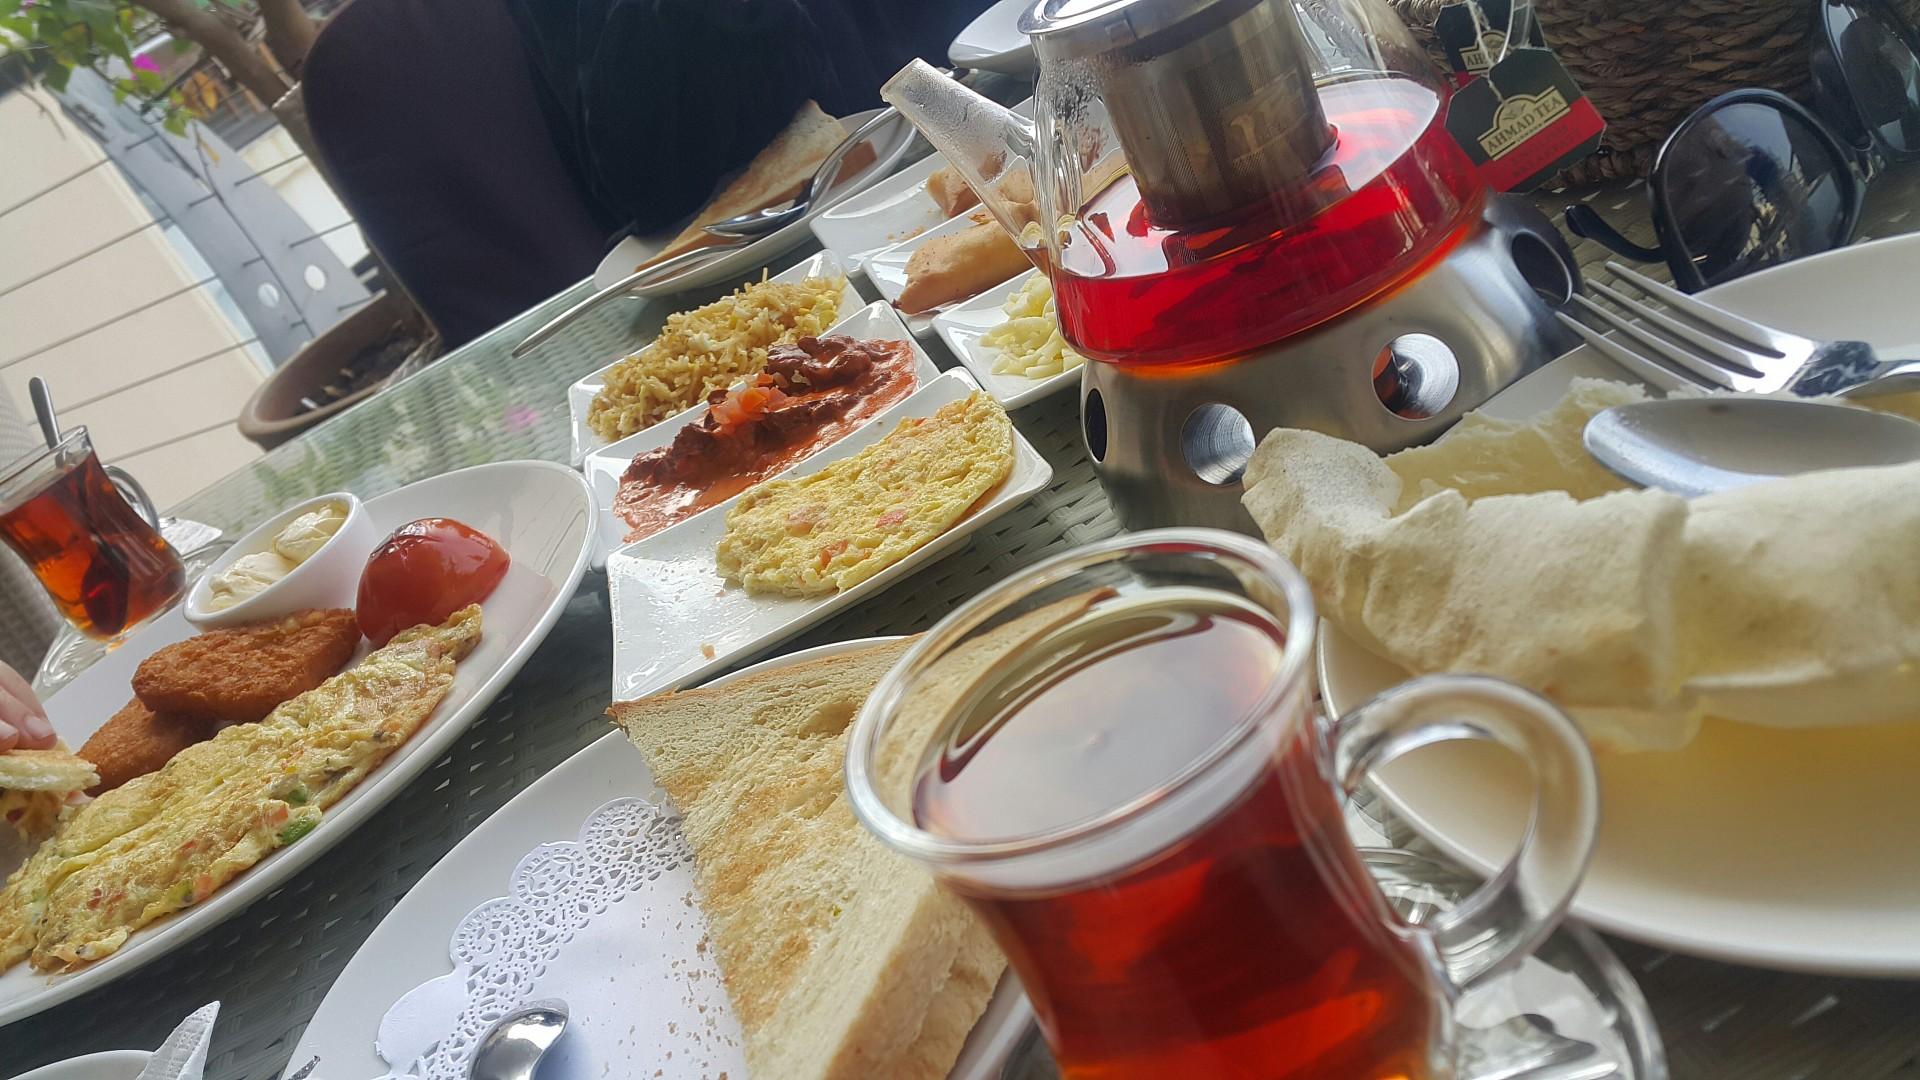 Traditional breakfast @ Flamingo Restaurant & Cafe - Bahrain